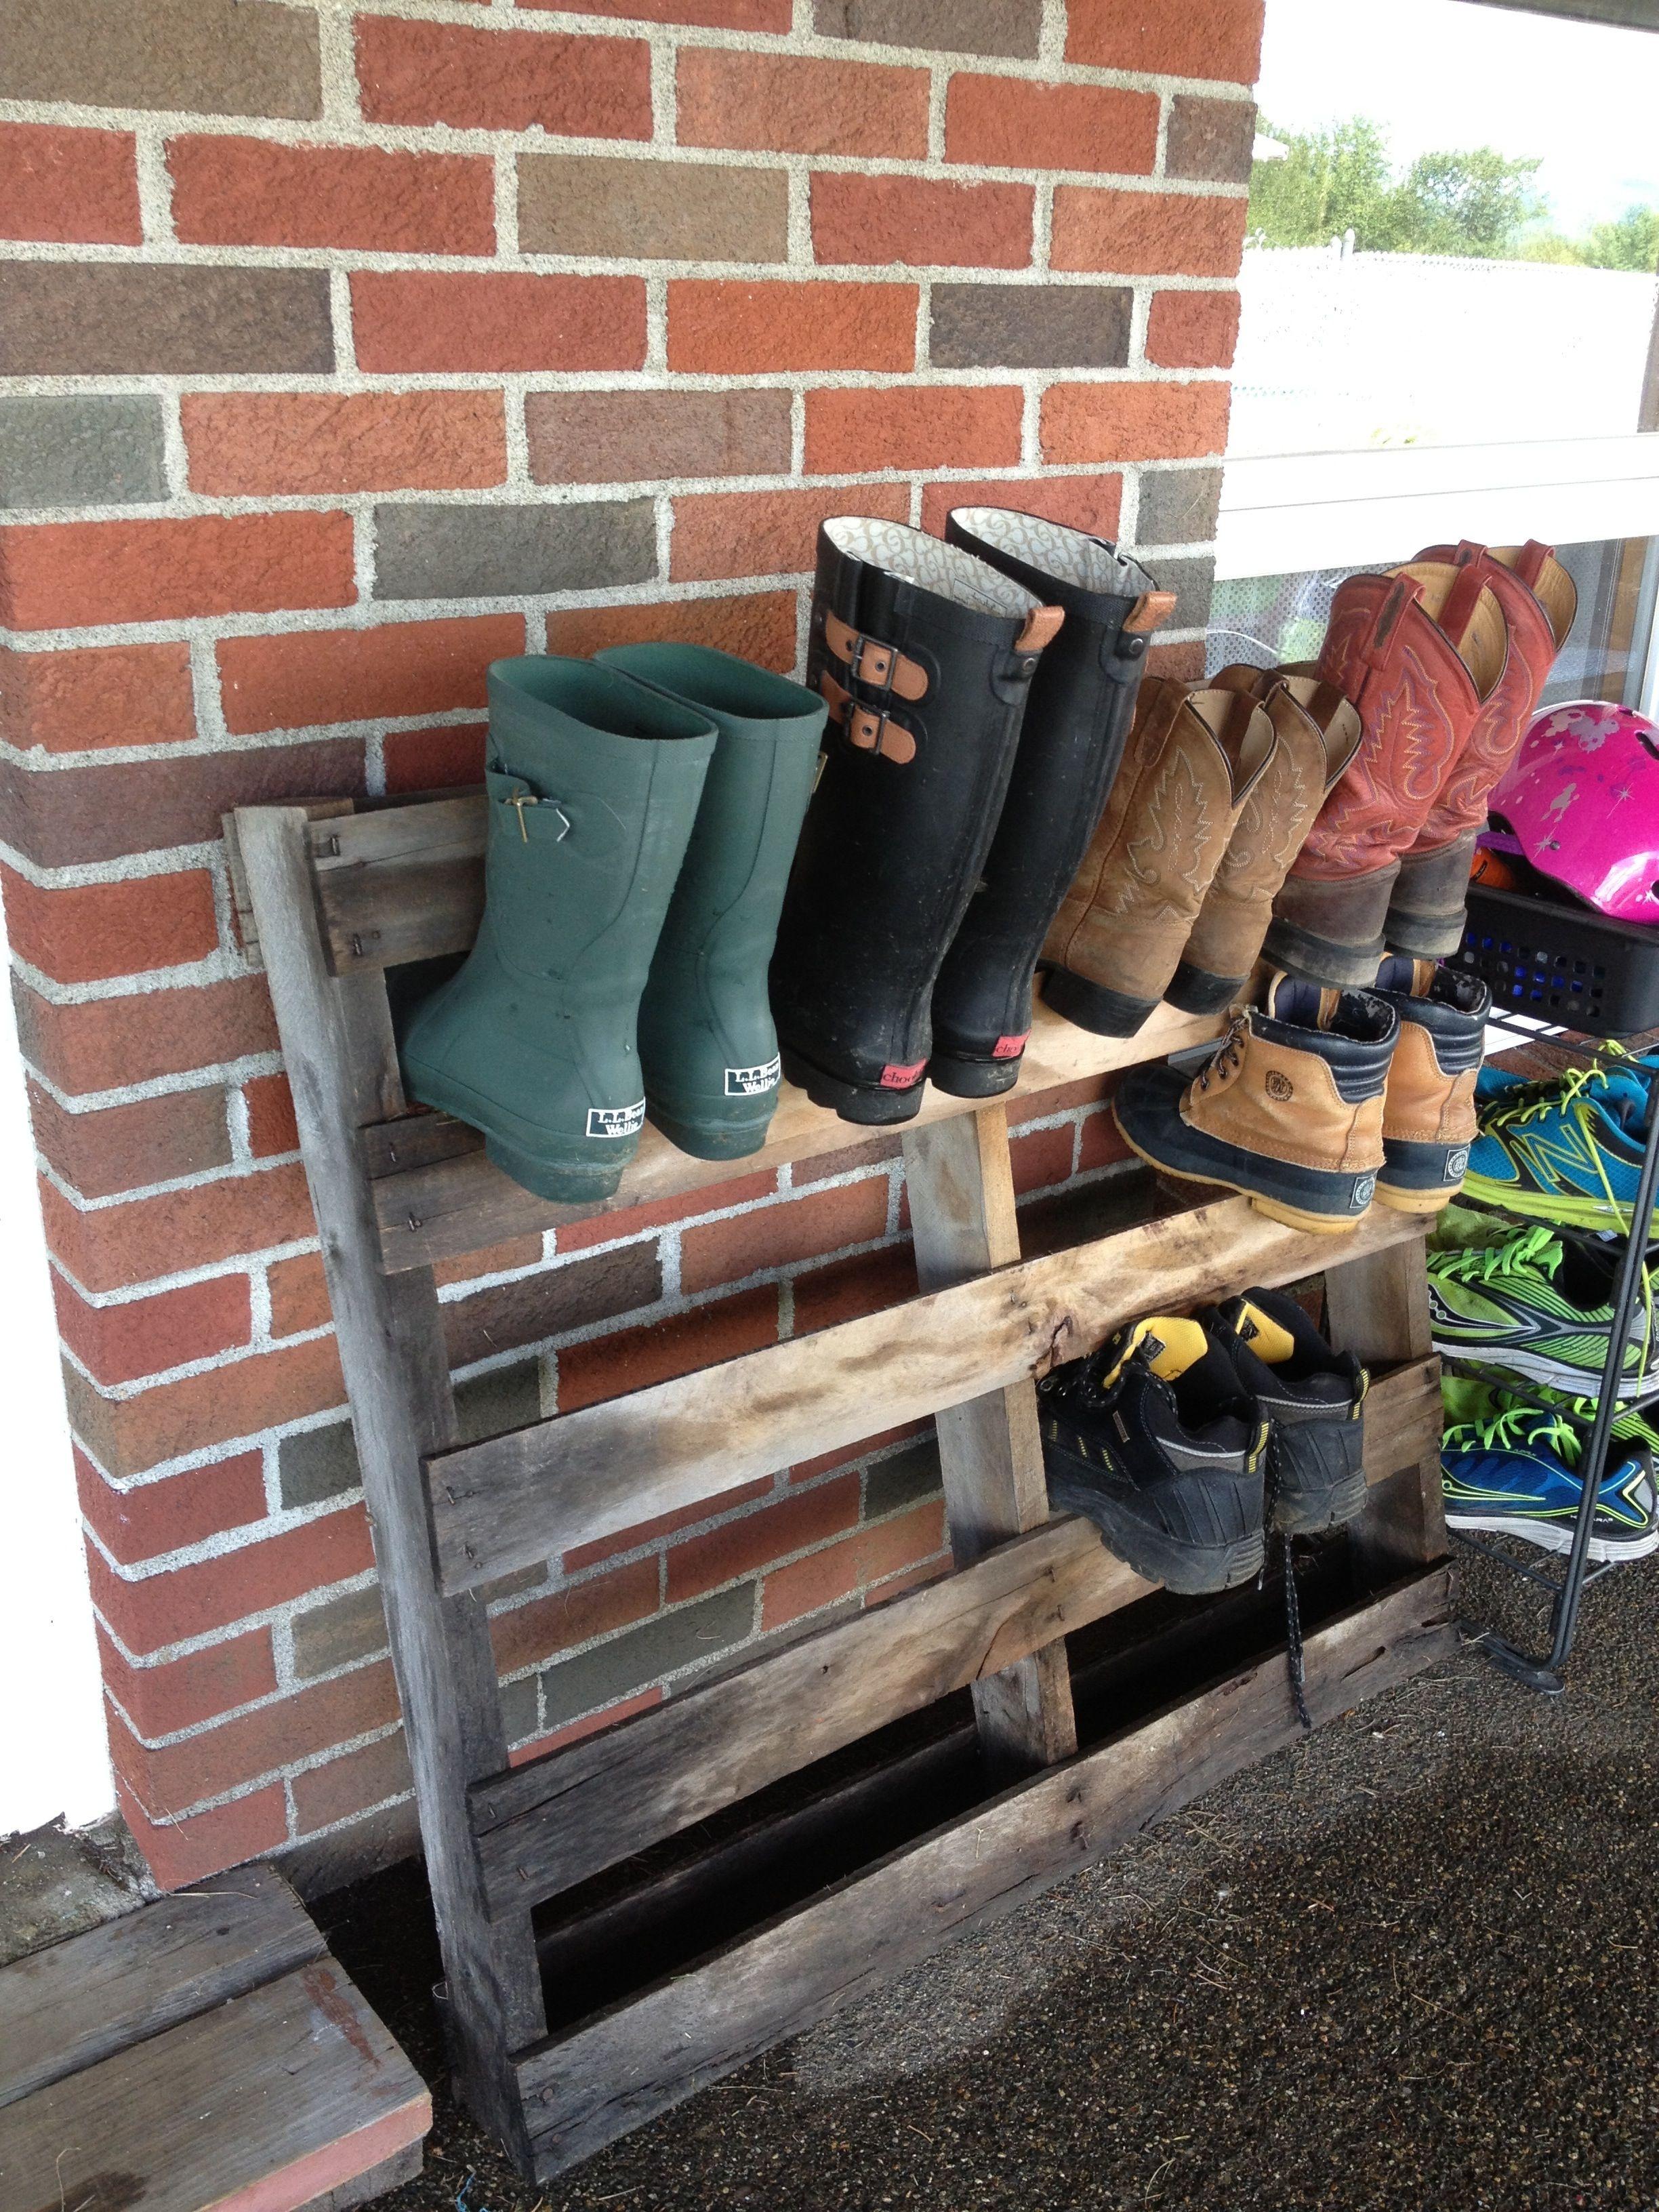 Pallet Boot Storage Clutter Organizations And Storage # Muebles Nemesis